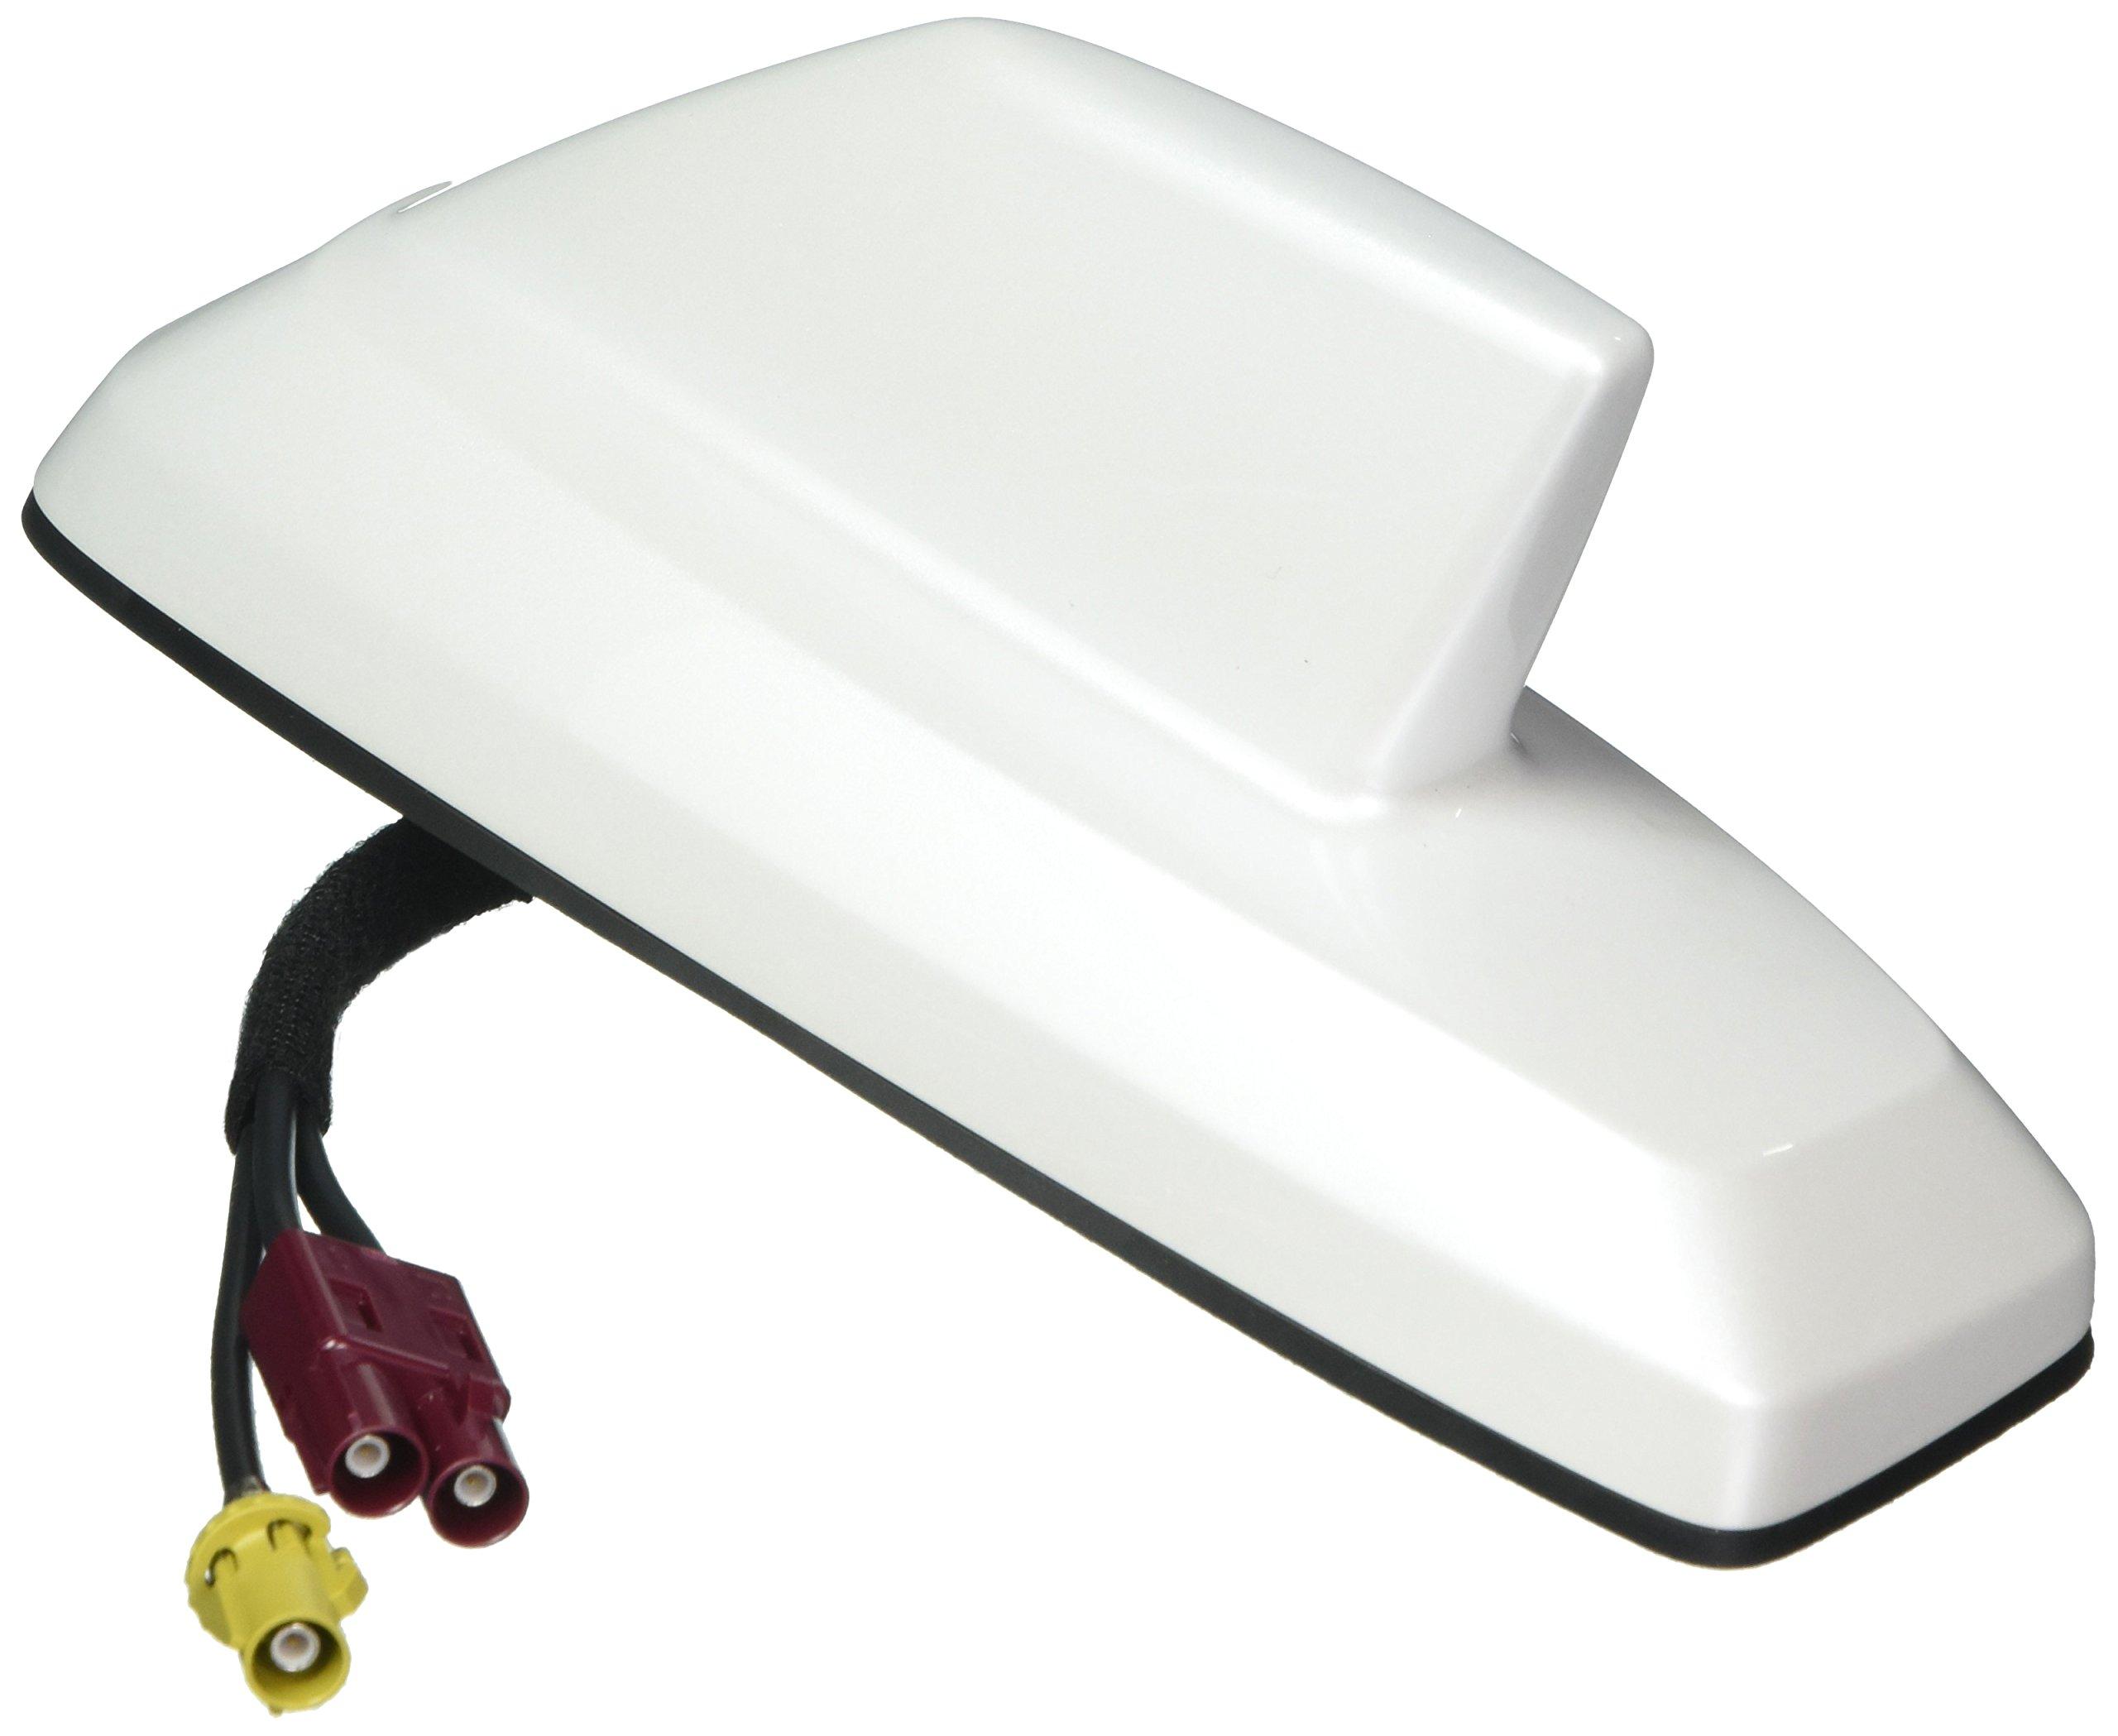 ACDelco 84346807 GM Original Equipment GPS Navigation System Antenna by ACDelco